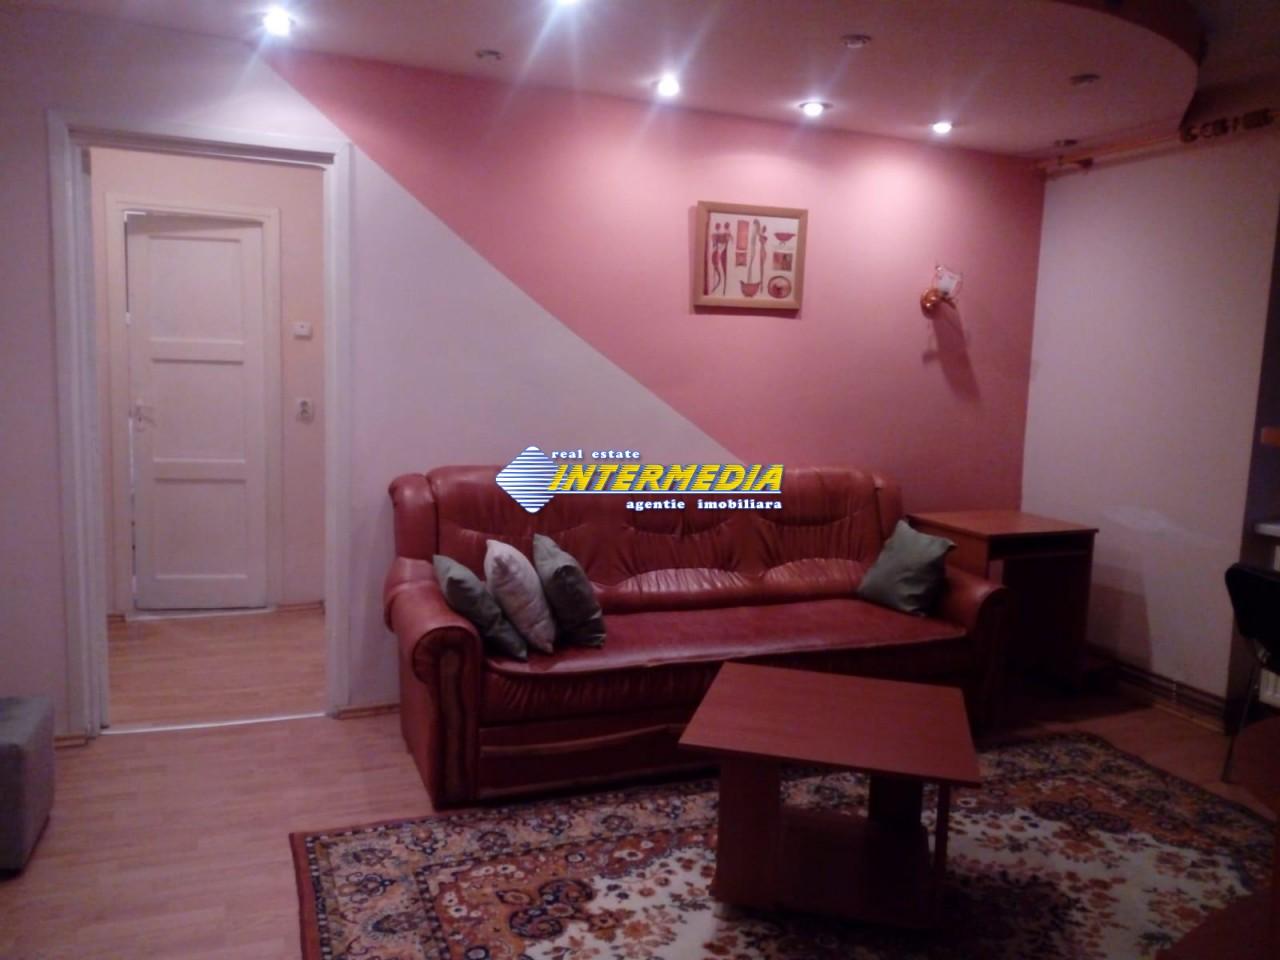 Apartament 2 camere de inchiriat in Centru Alba Iulia 250 Euro (6)_(1).jpeg